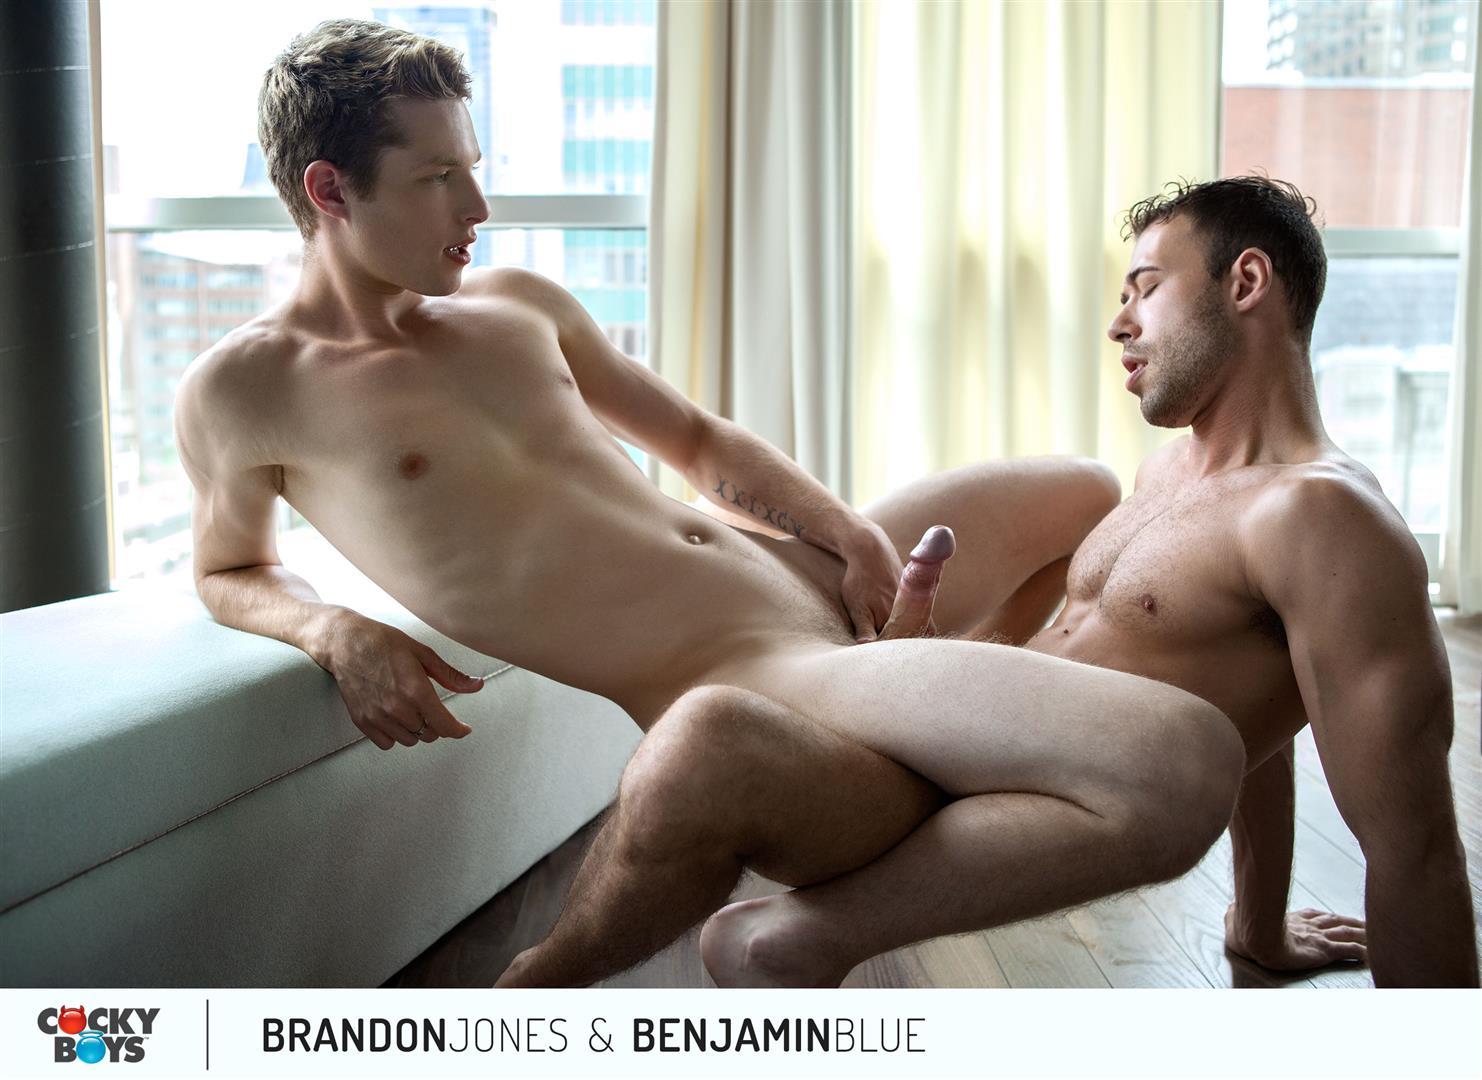 Cockyboys Benjamin Blue and Brandon Jones Flip Flop Fuck Amateur Gay Porn 23 Cockyboys: Benjamin Blue Tops Brandon Jones For The First Time